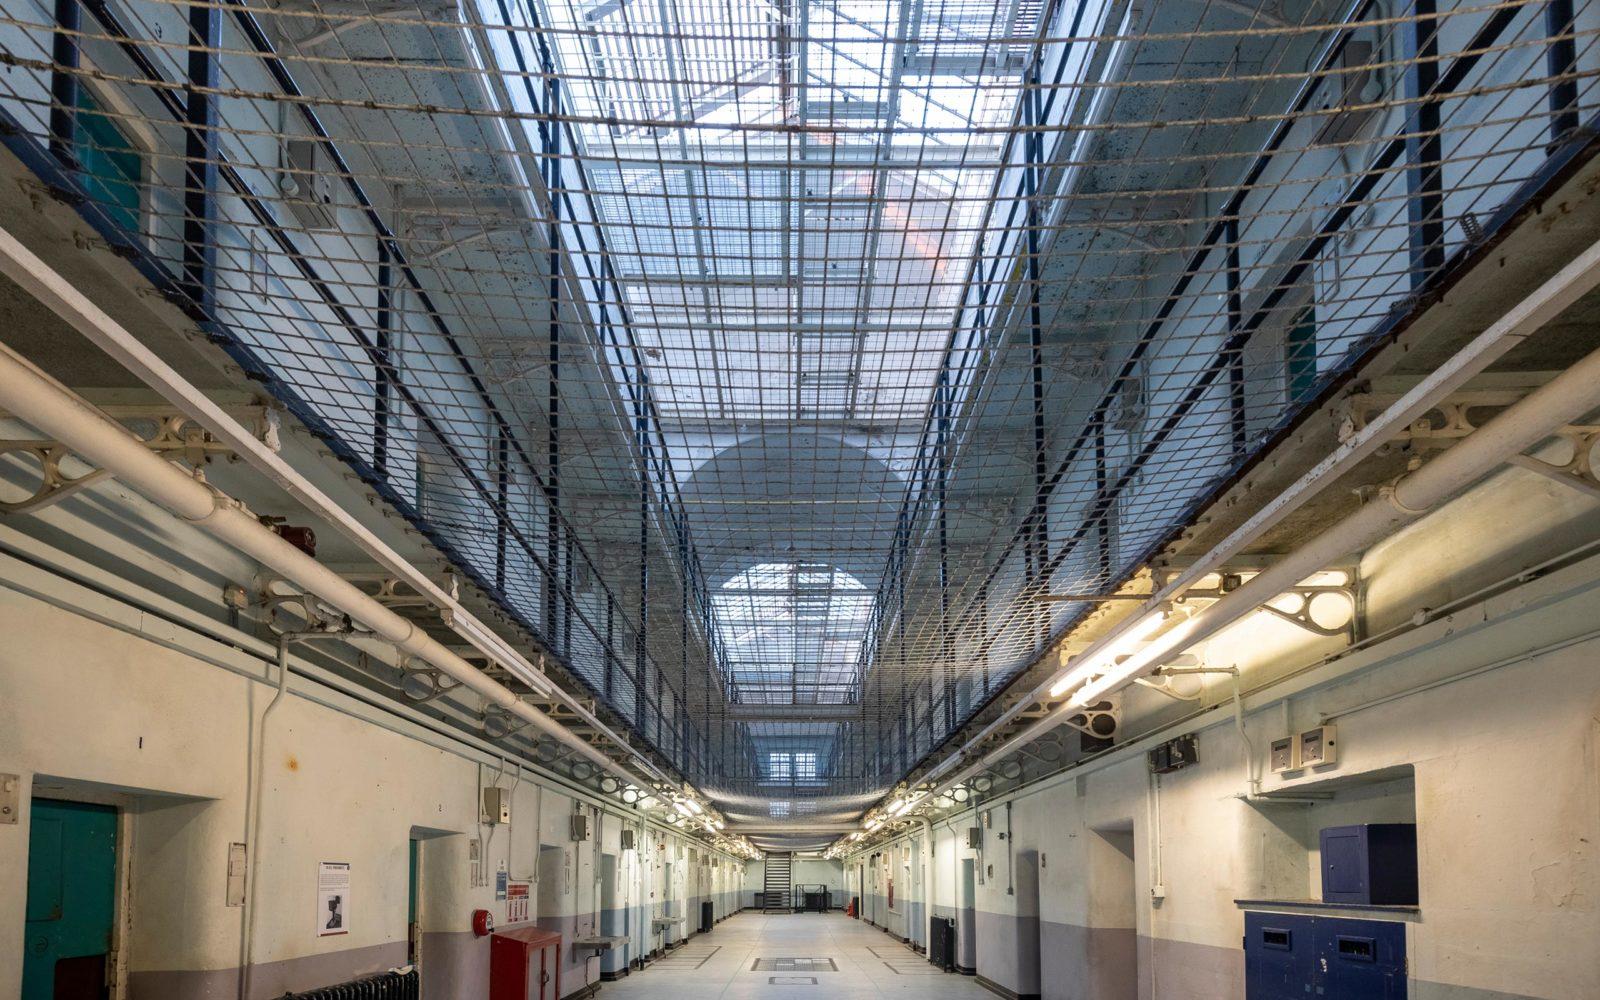 Shepton Mallet Prison Coach Company Bookings